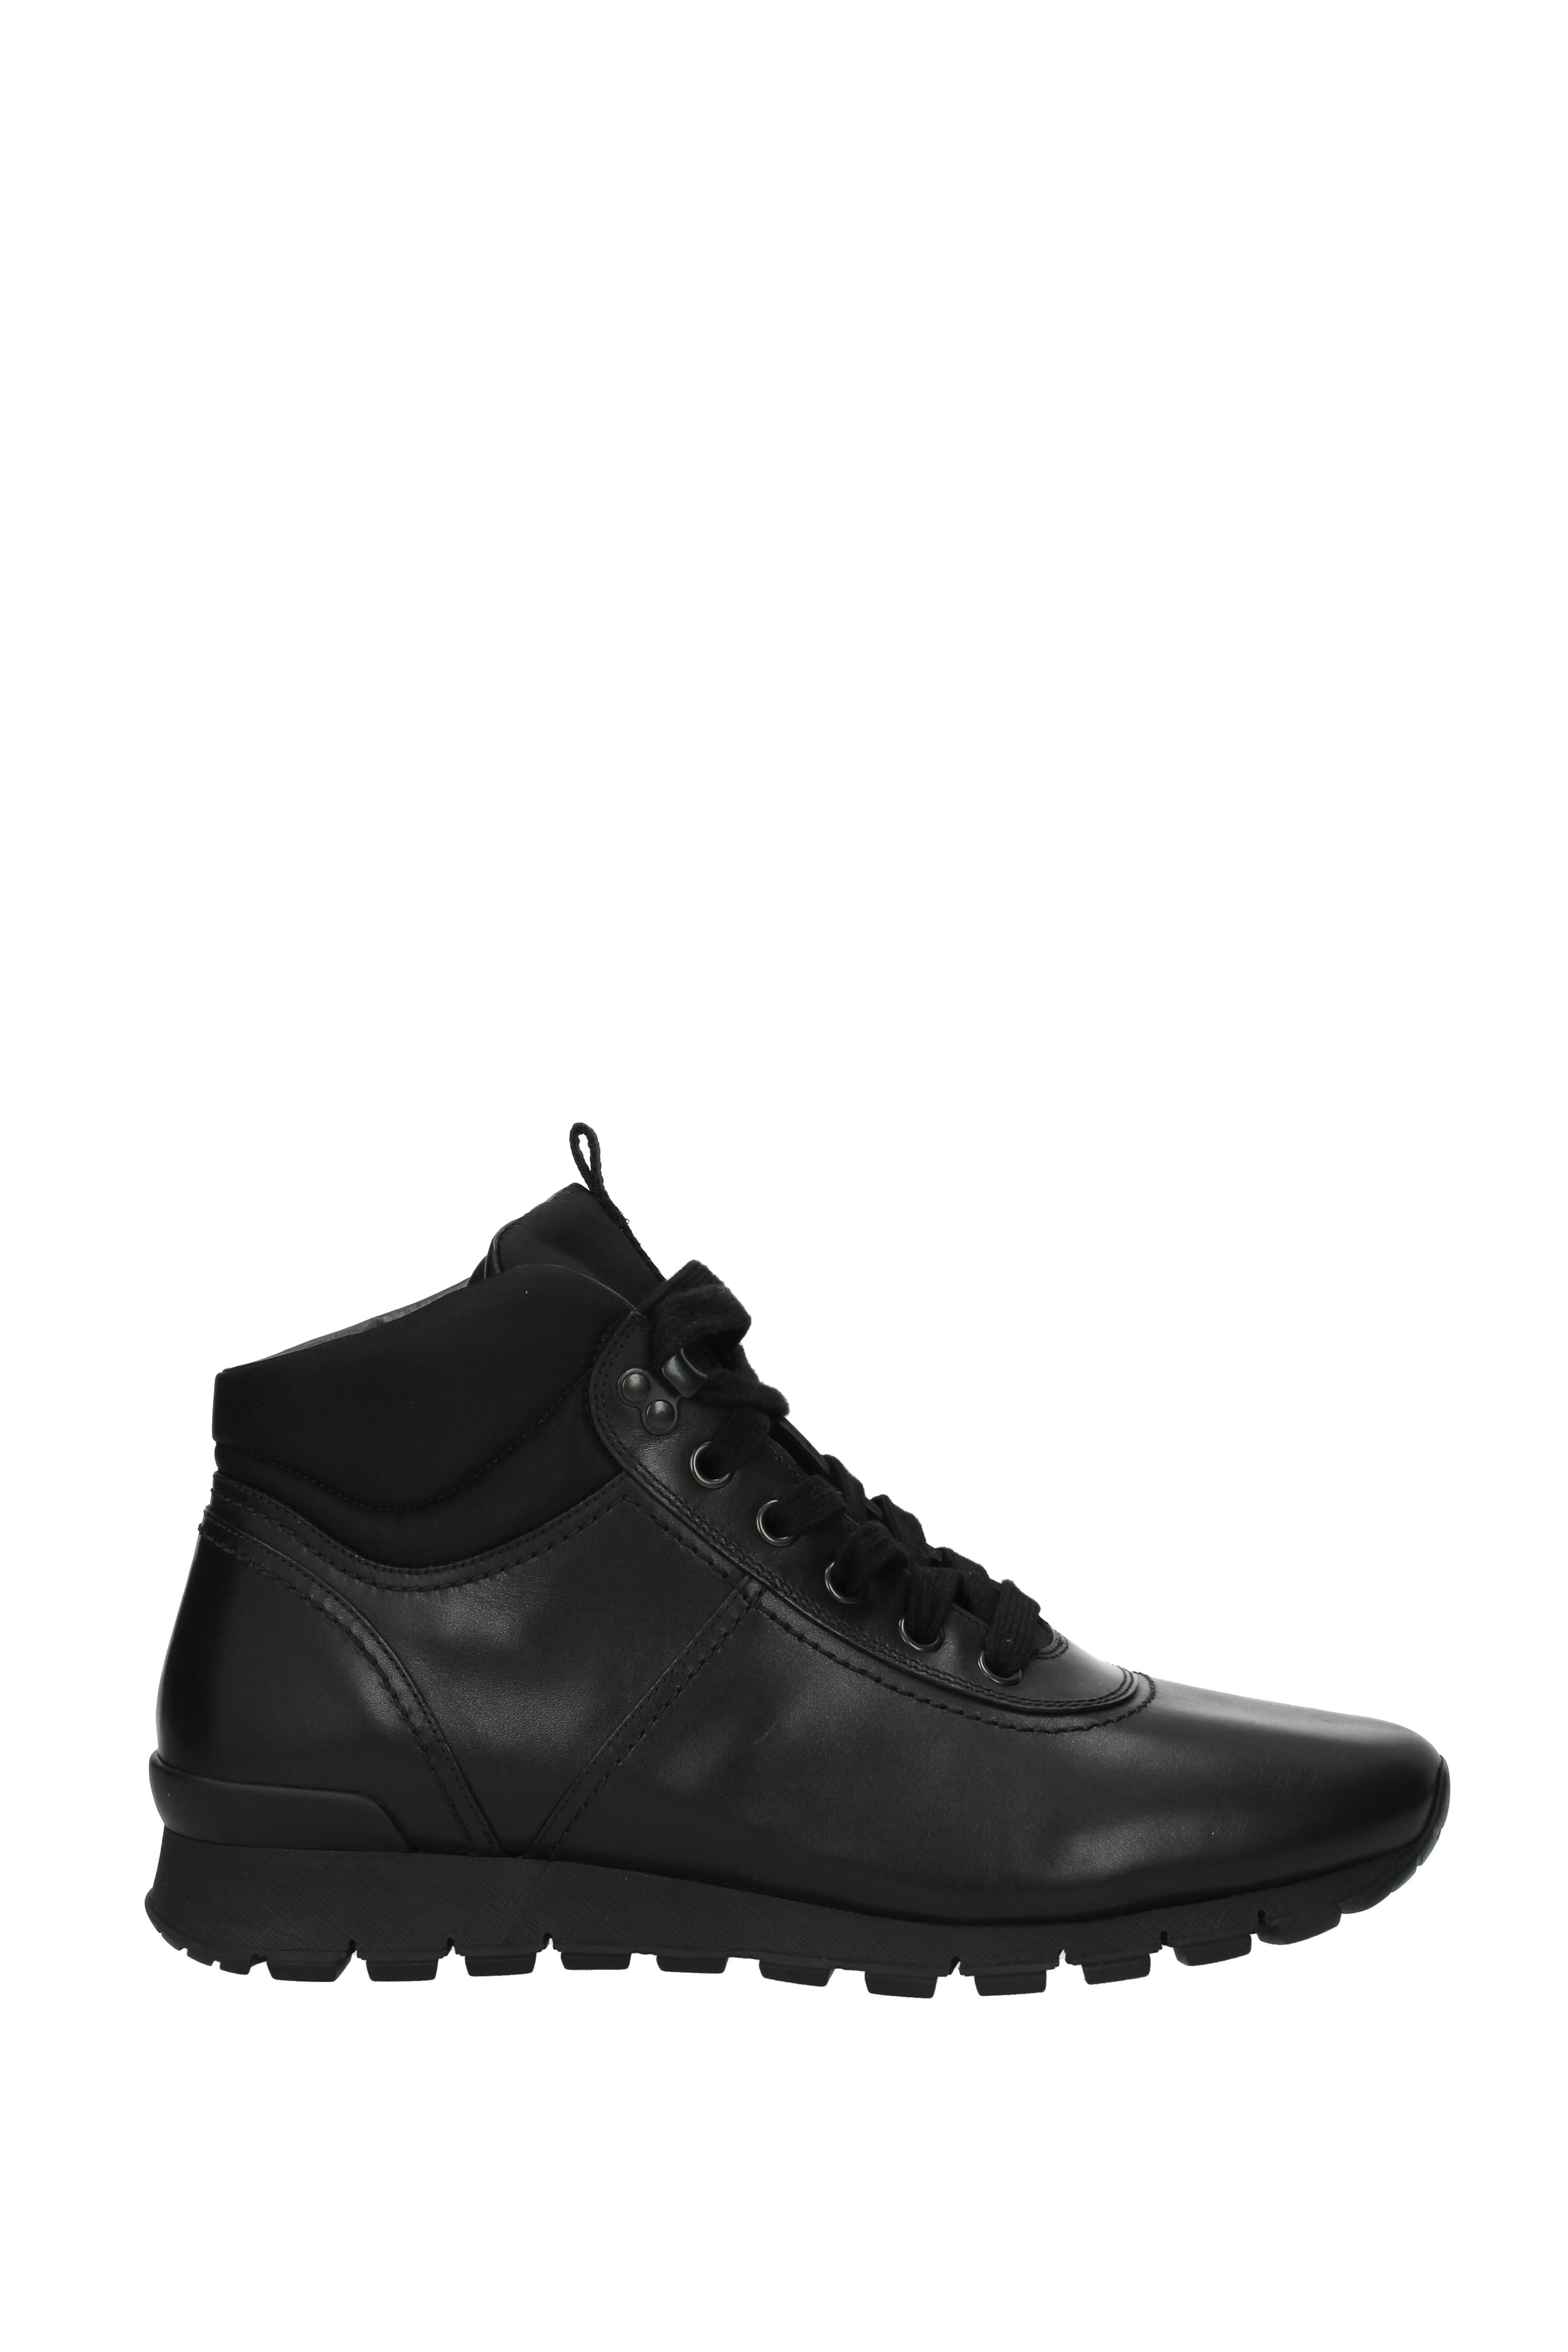 Sneakers Prada Herren - (4T3040) Leder (4T3040) - 29872f